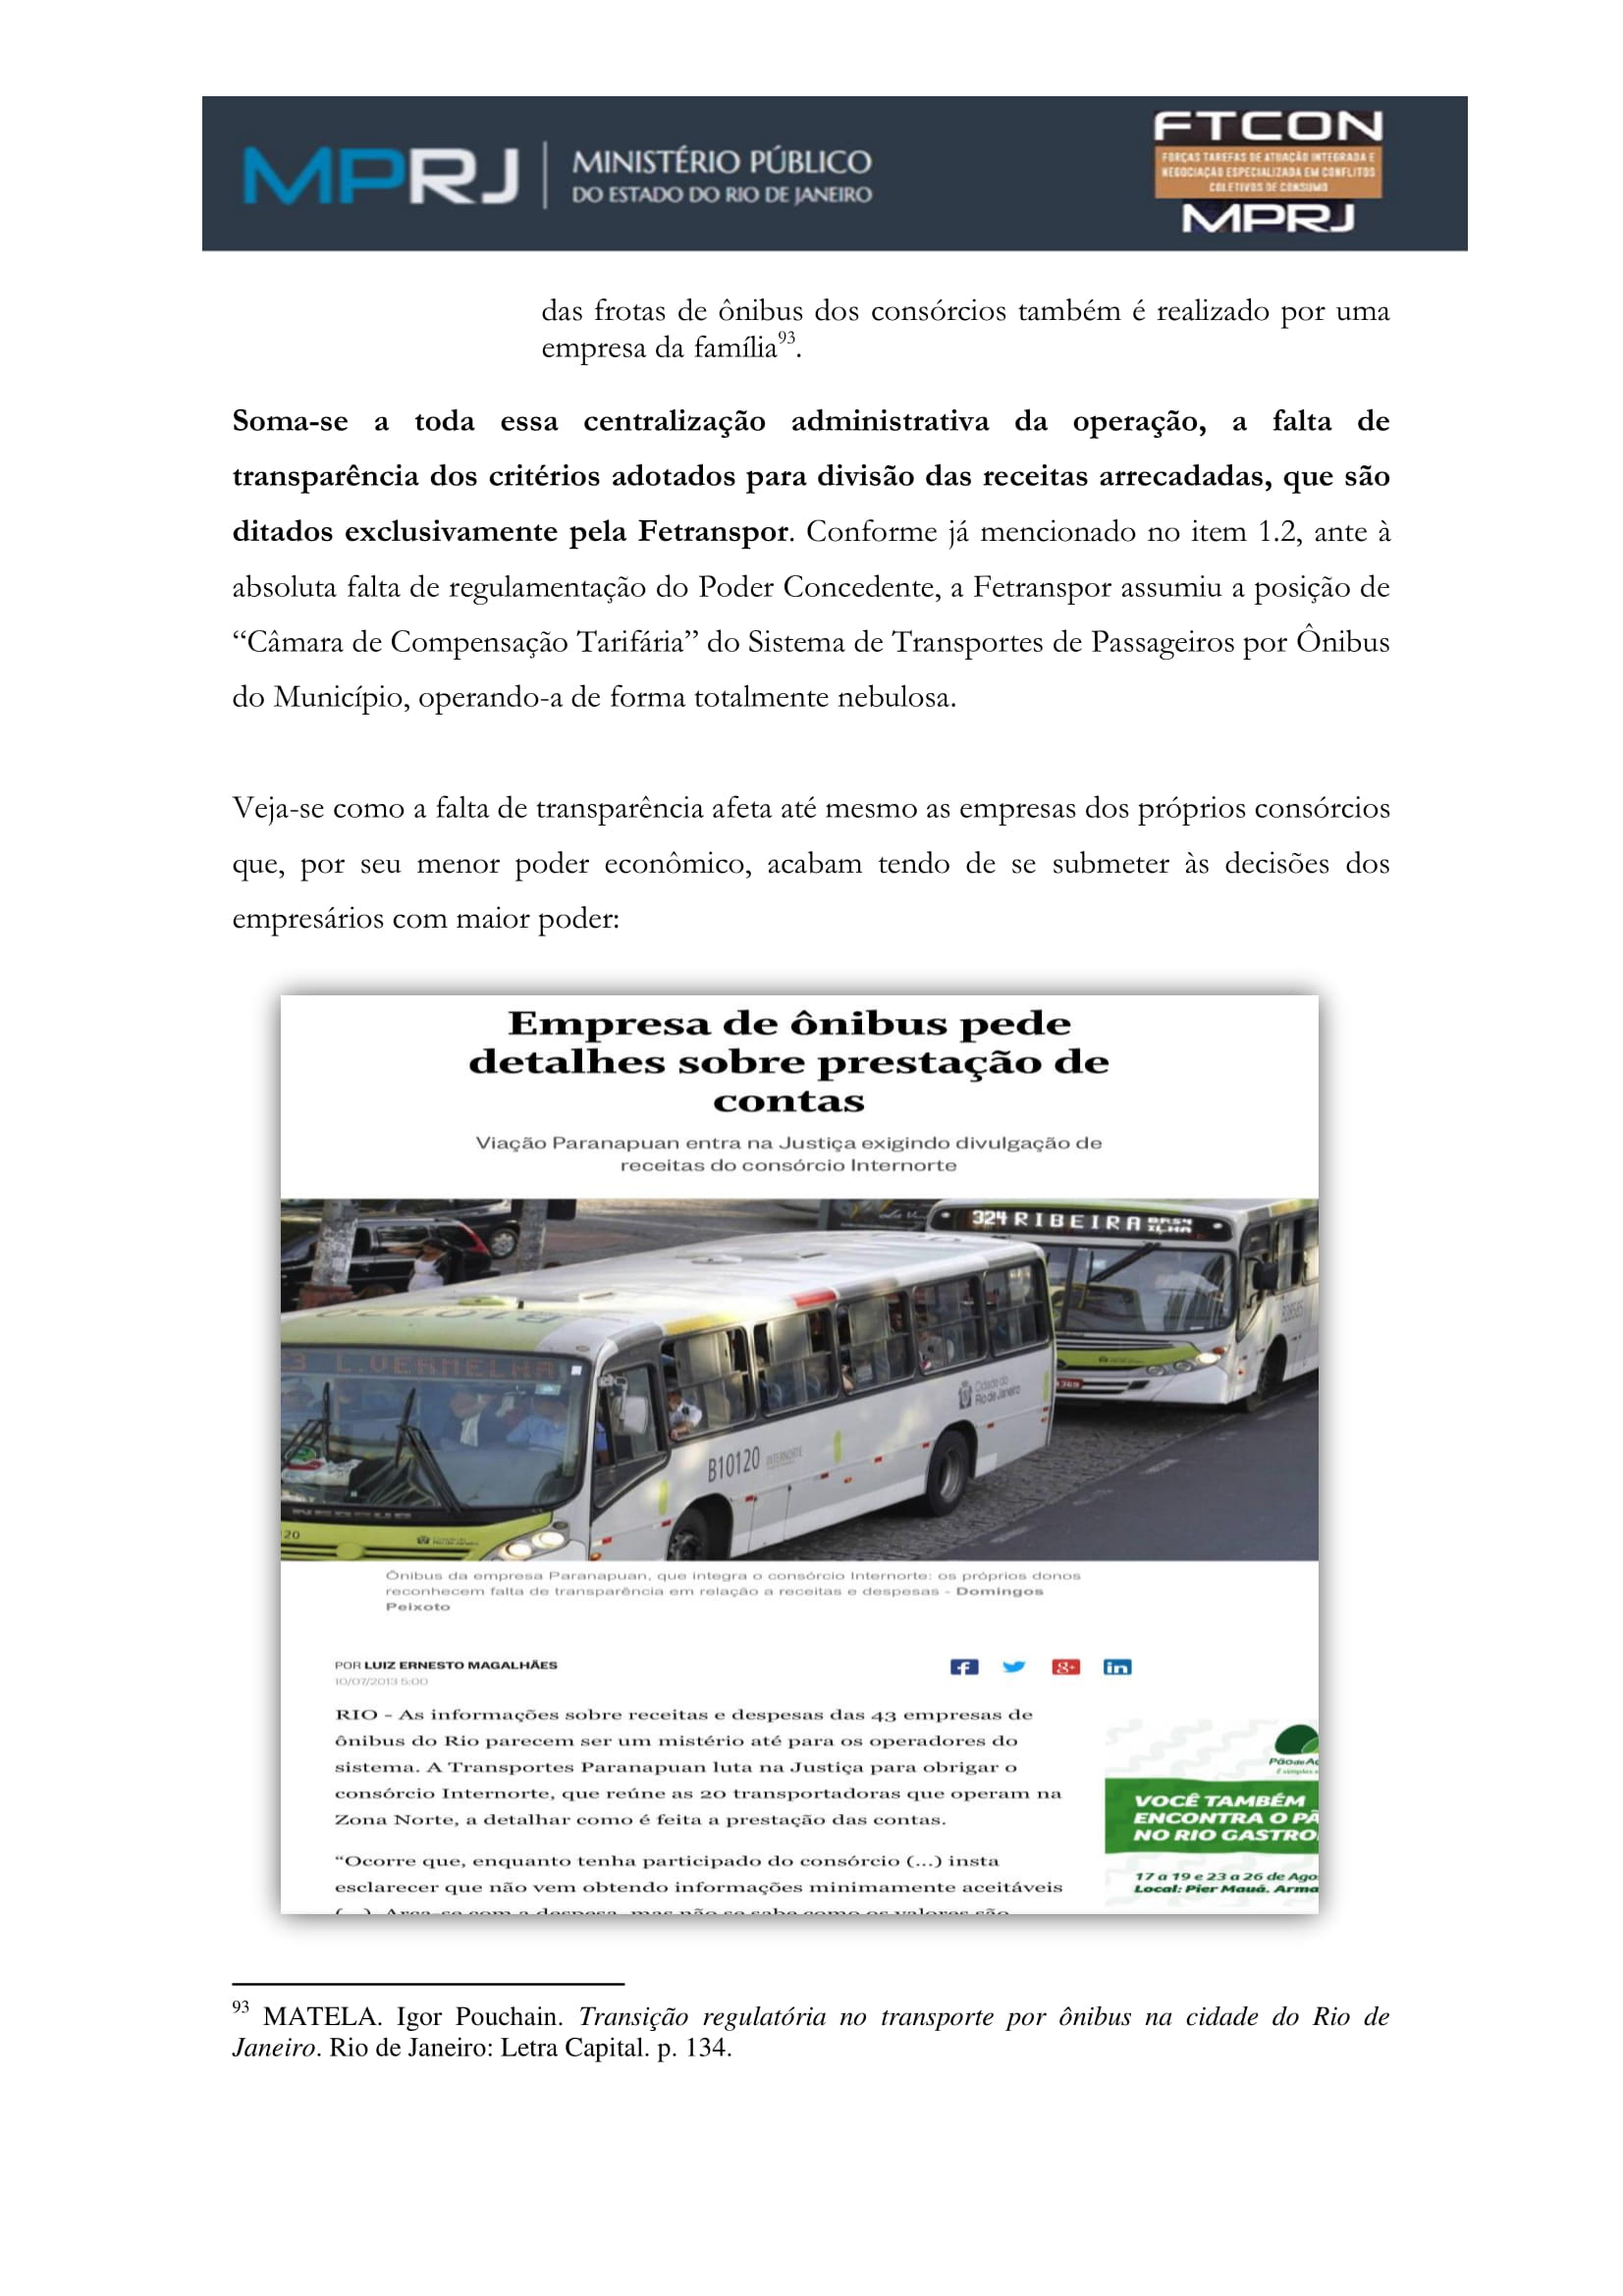 acp_caducidade_onibus_dr_rt-104